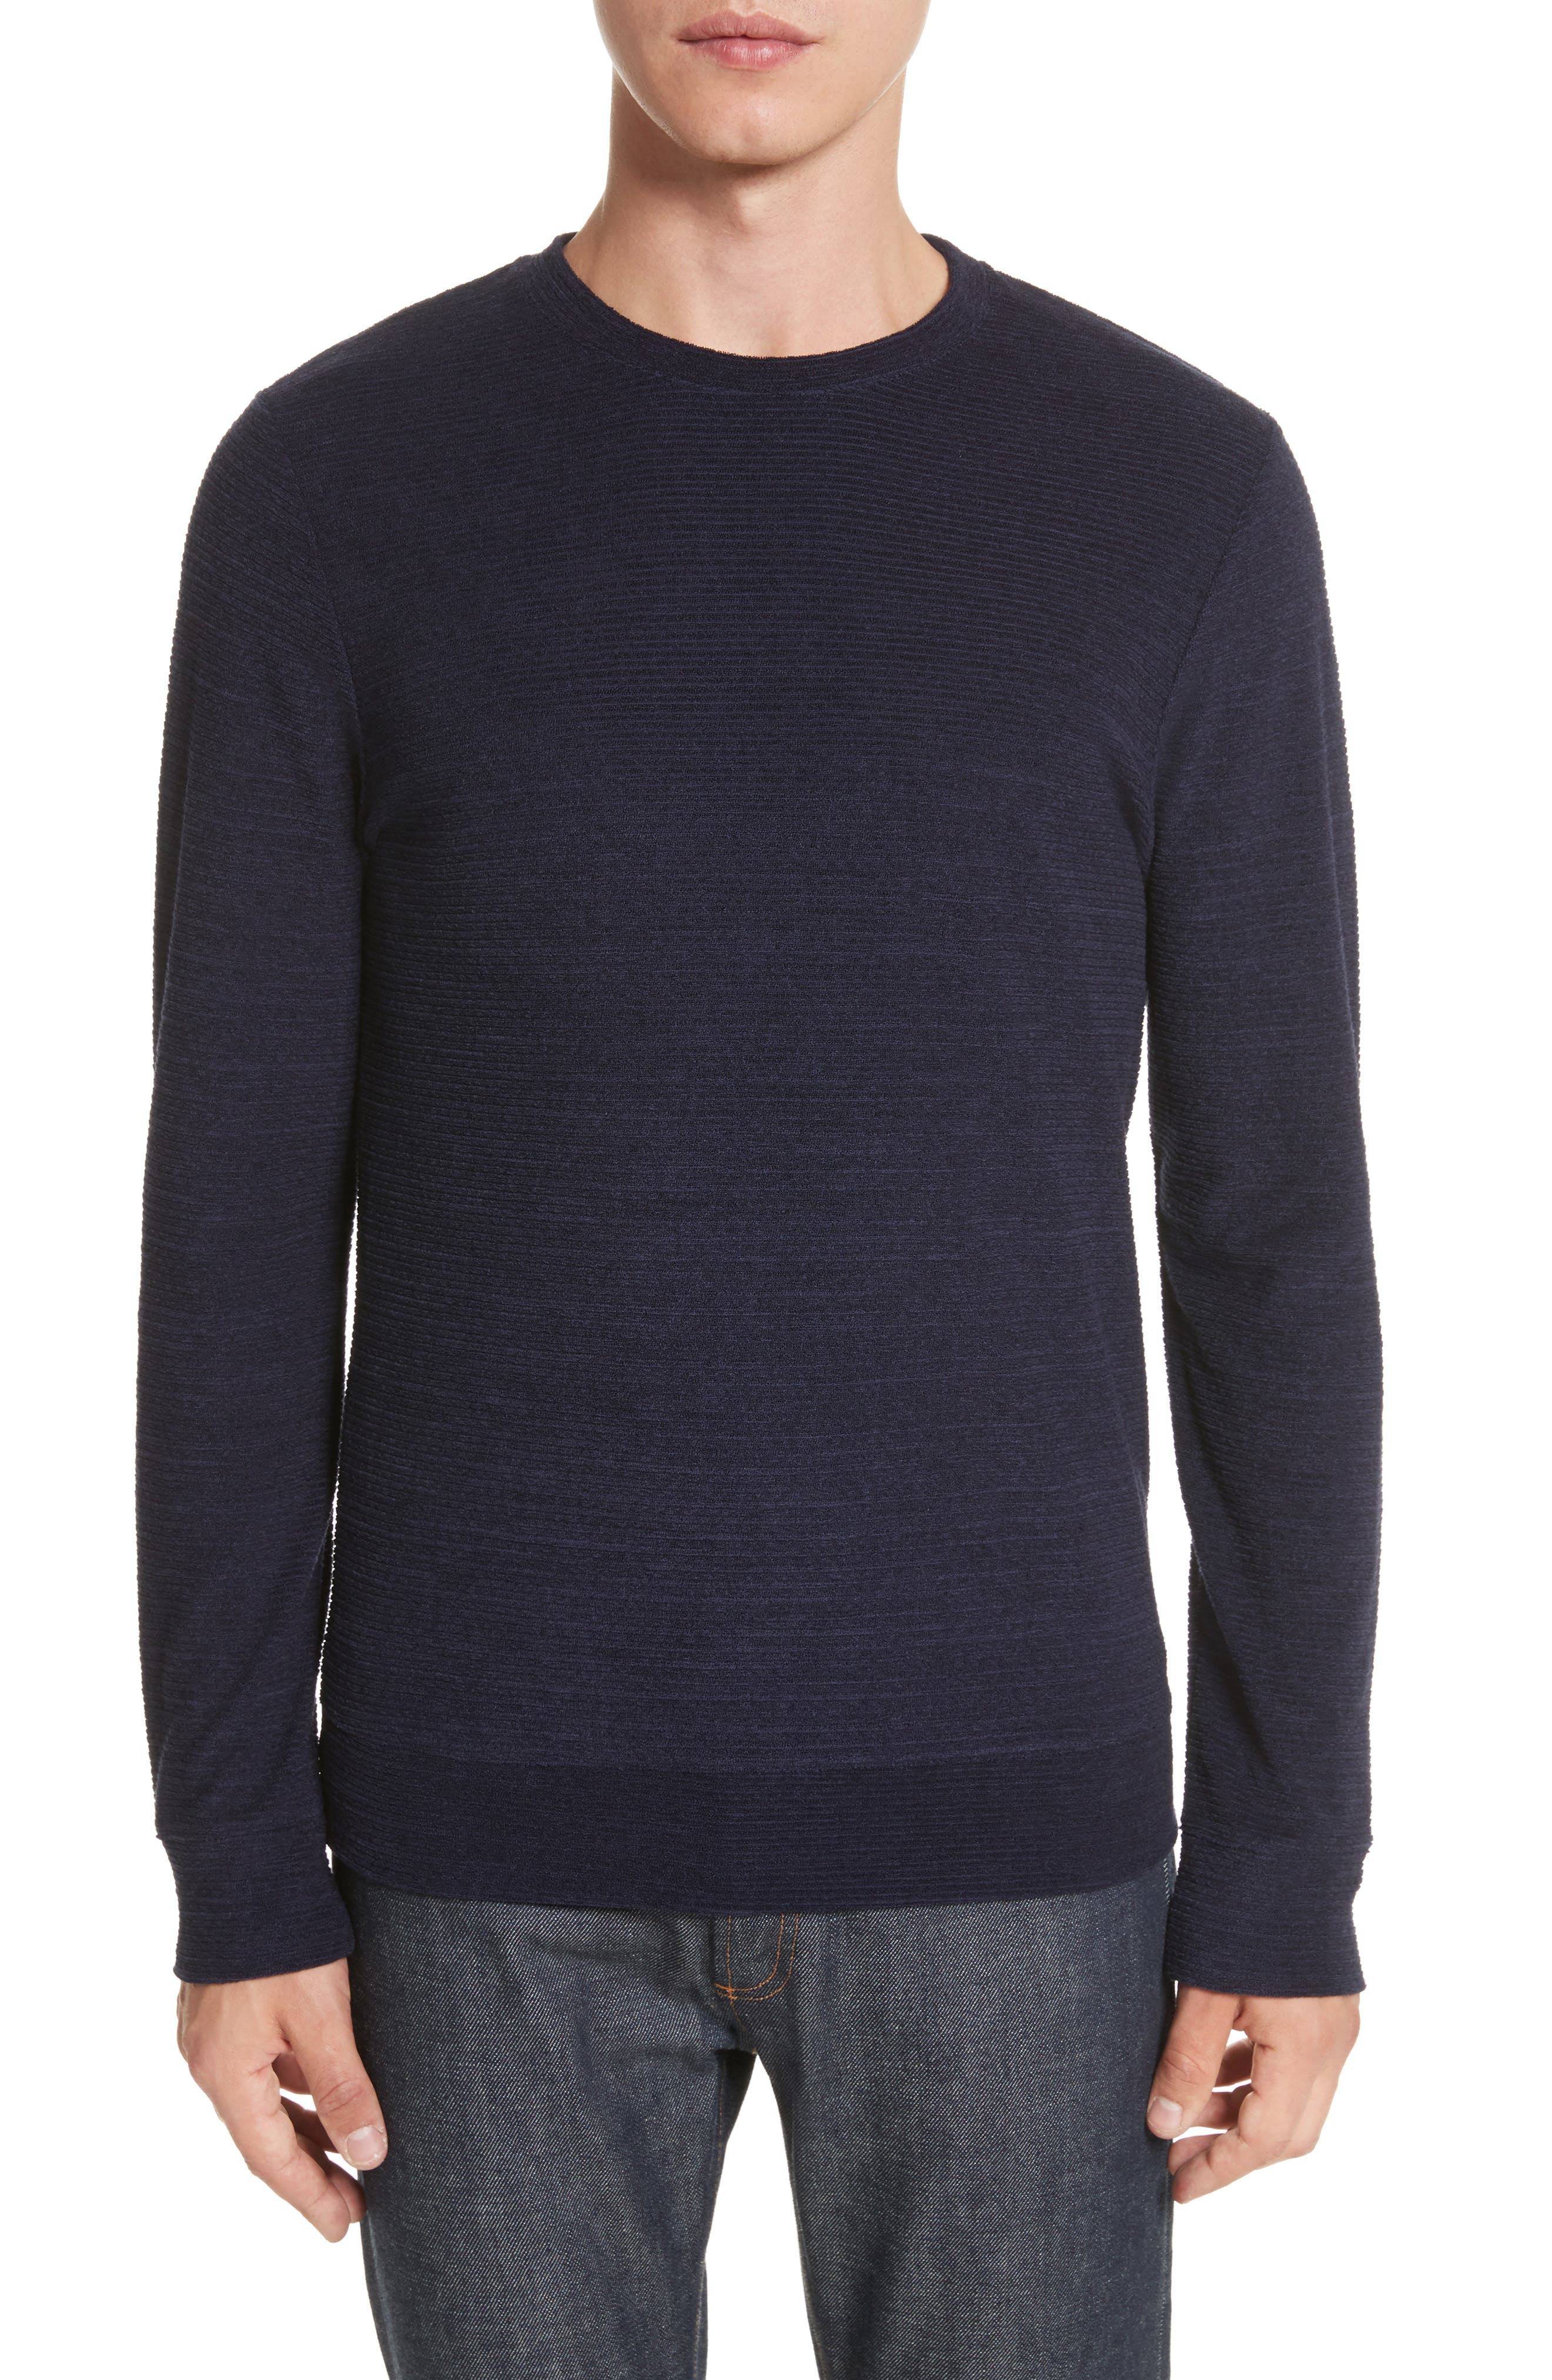 Jeremie Crewneck Sweater,                             Main thumbnail 1, color,                             Marine